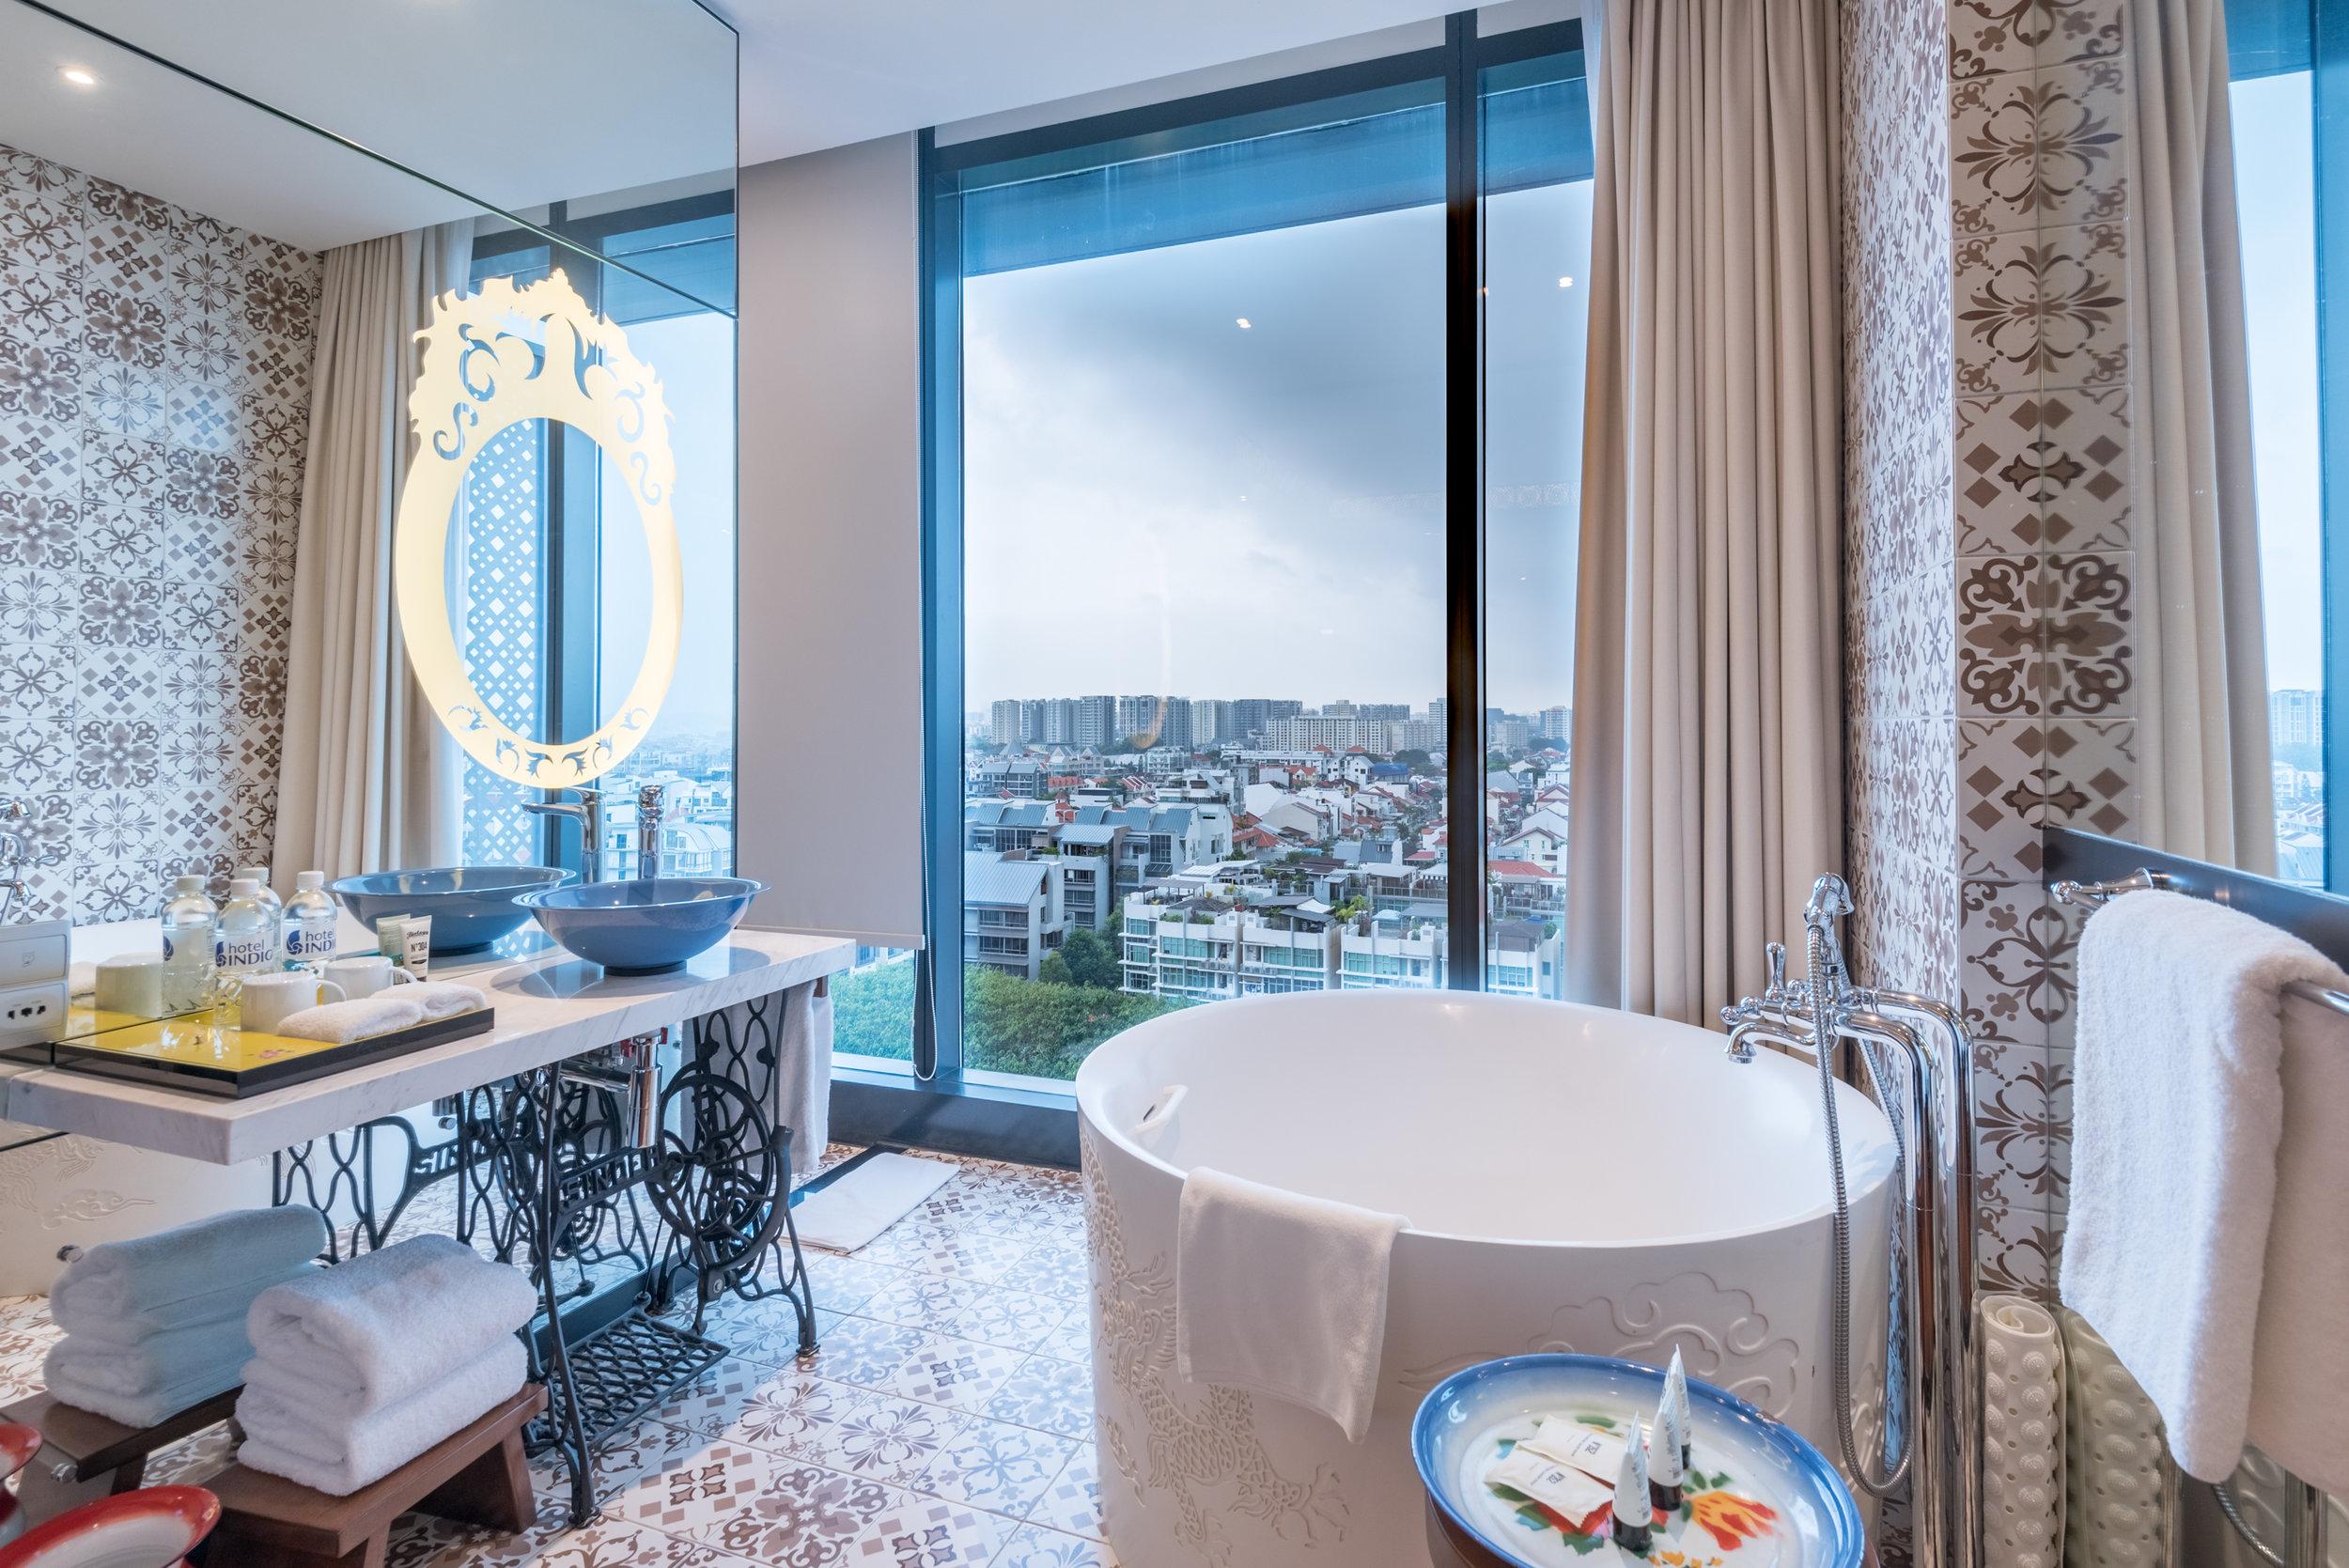 Bathtub  Premier View Room with Bathtub - Hotel Indigo Singapore Katong